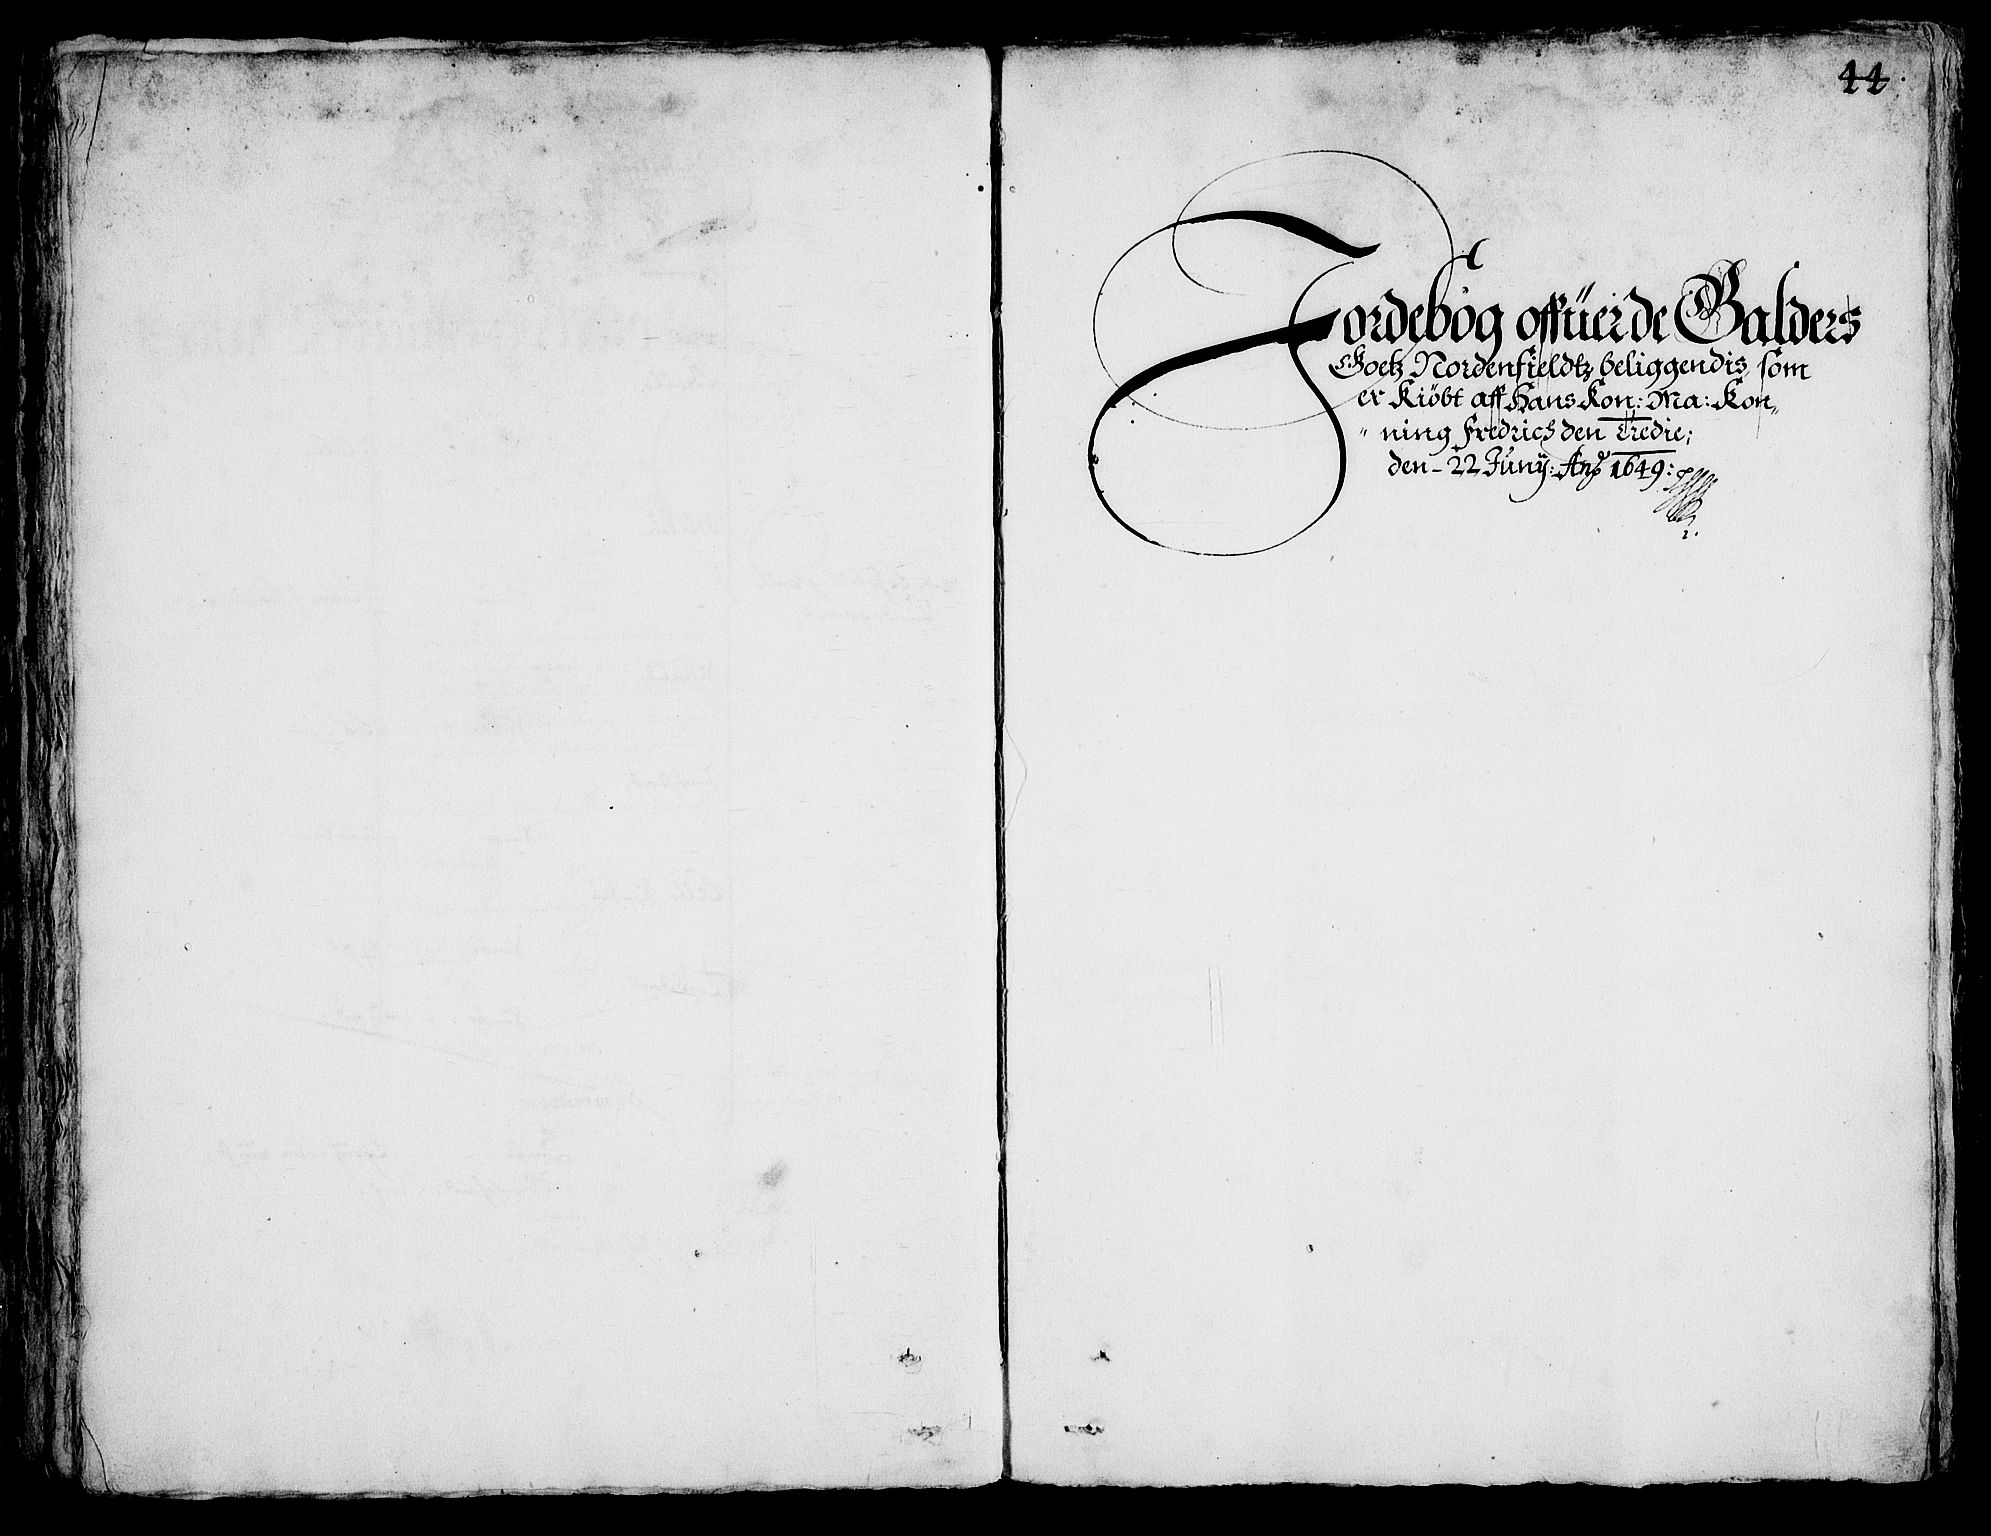 RA, Rentekammeret inntil 1814, Realistisk ordnet avdeling, On/L0001: Statens gods, 1651, s. 1043b-1044a